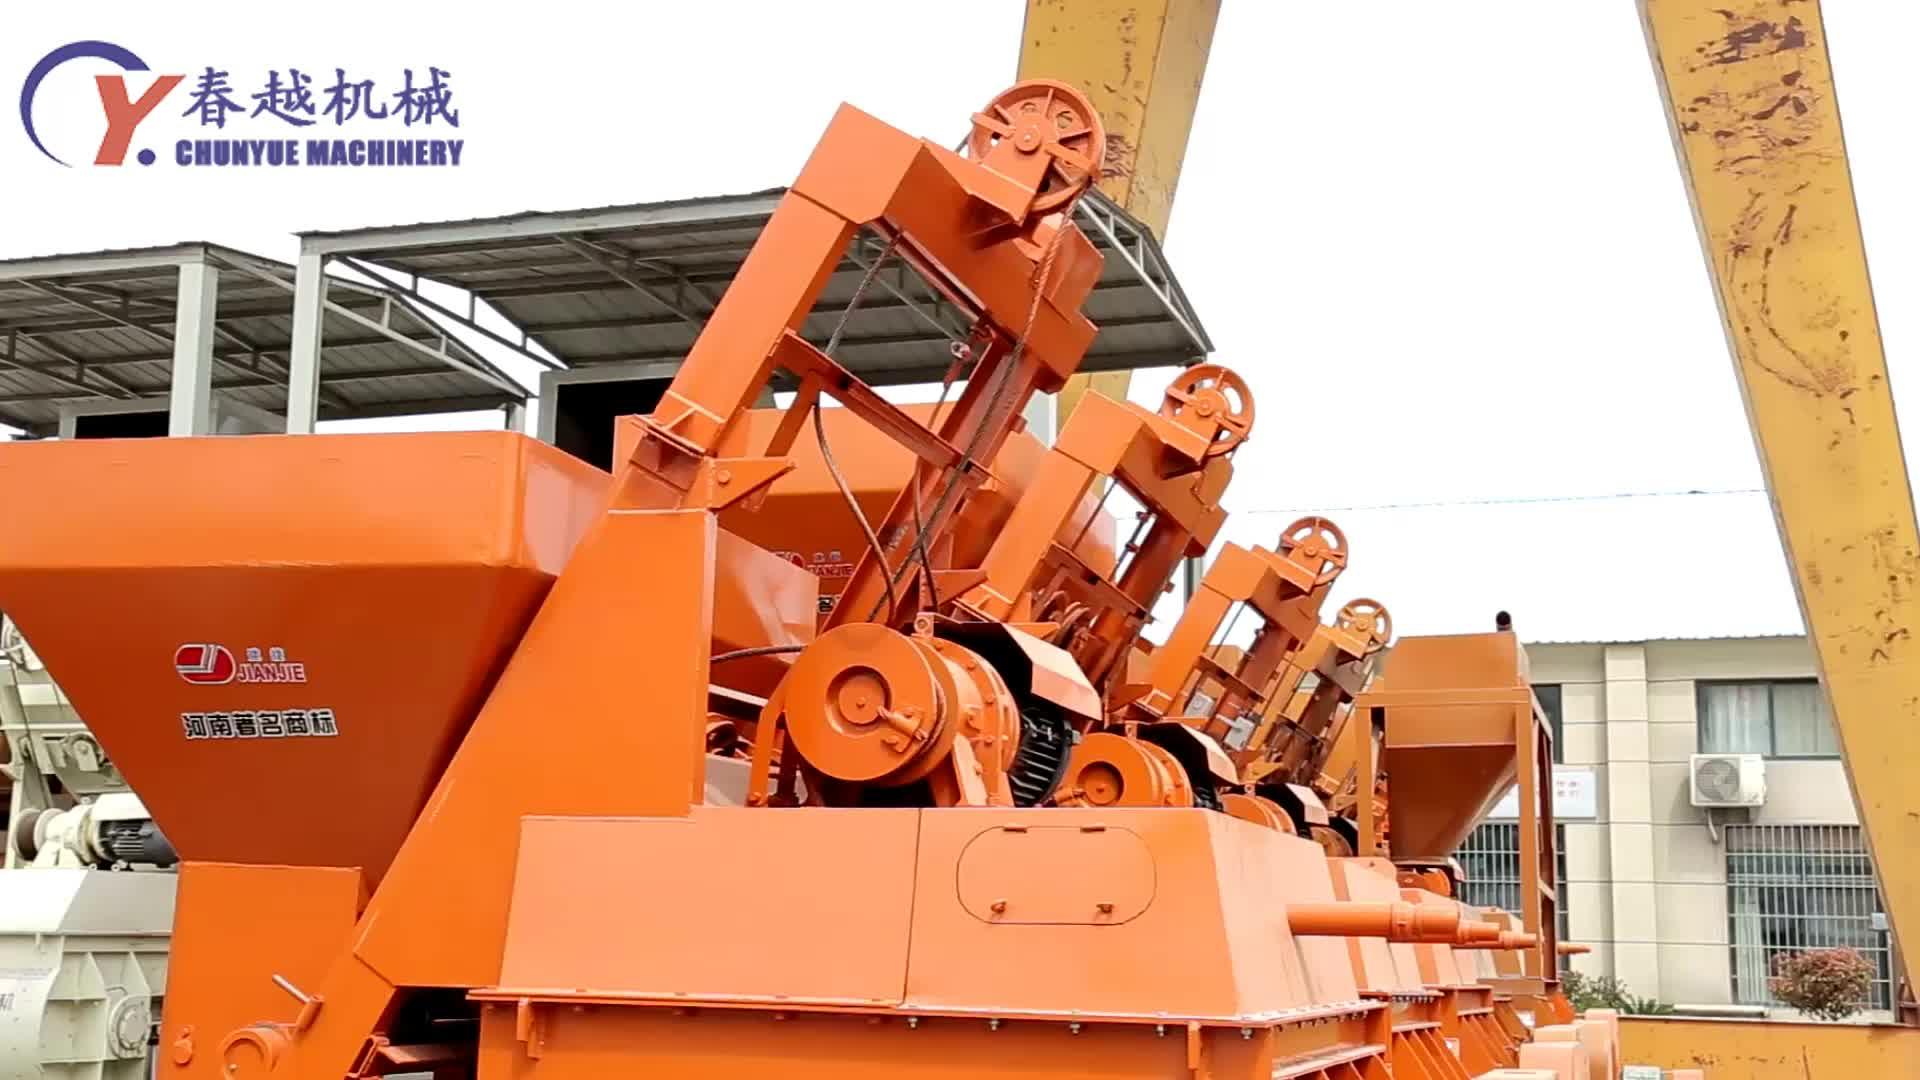 Fabriek leverancier draagbare elba harga mini 35m3/h HZS35 beton mengen groeperen plant